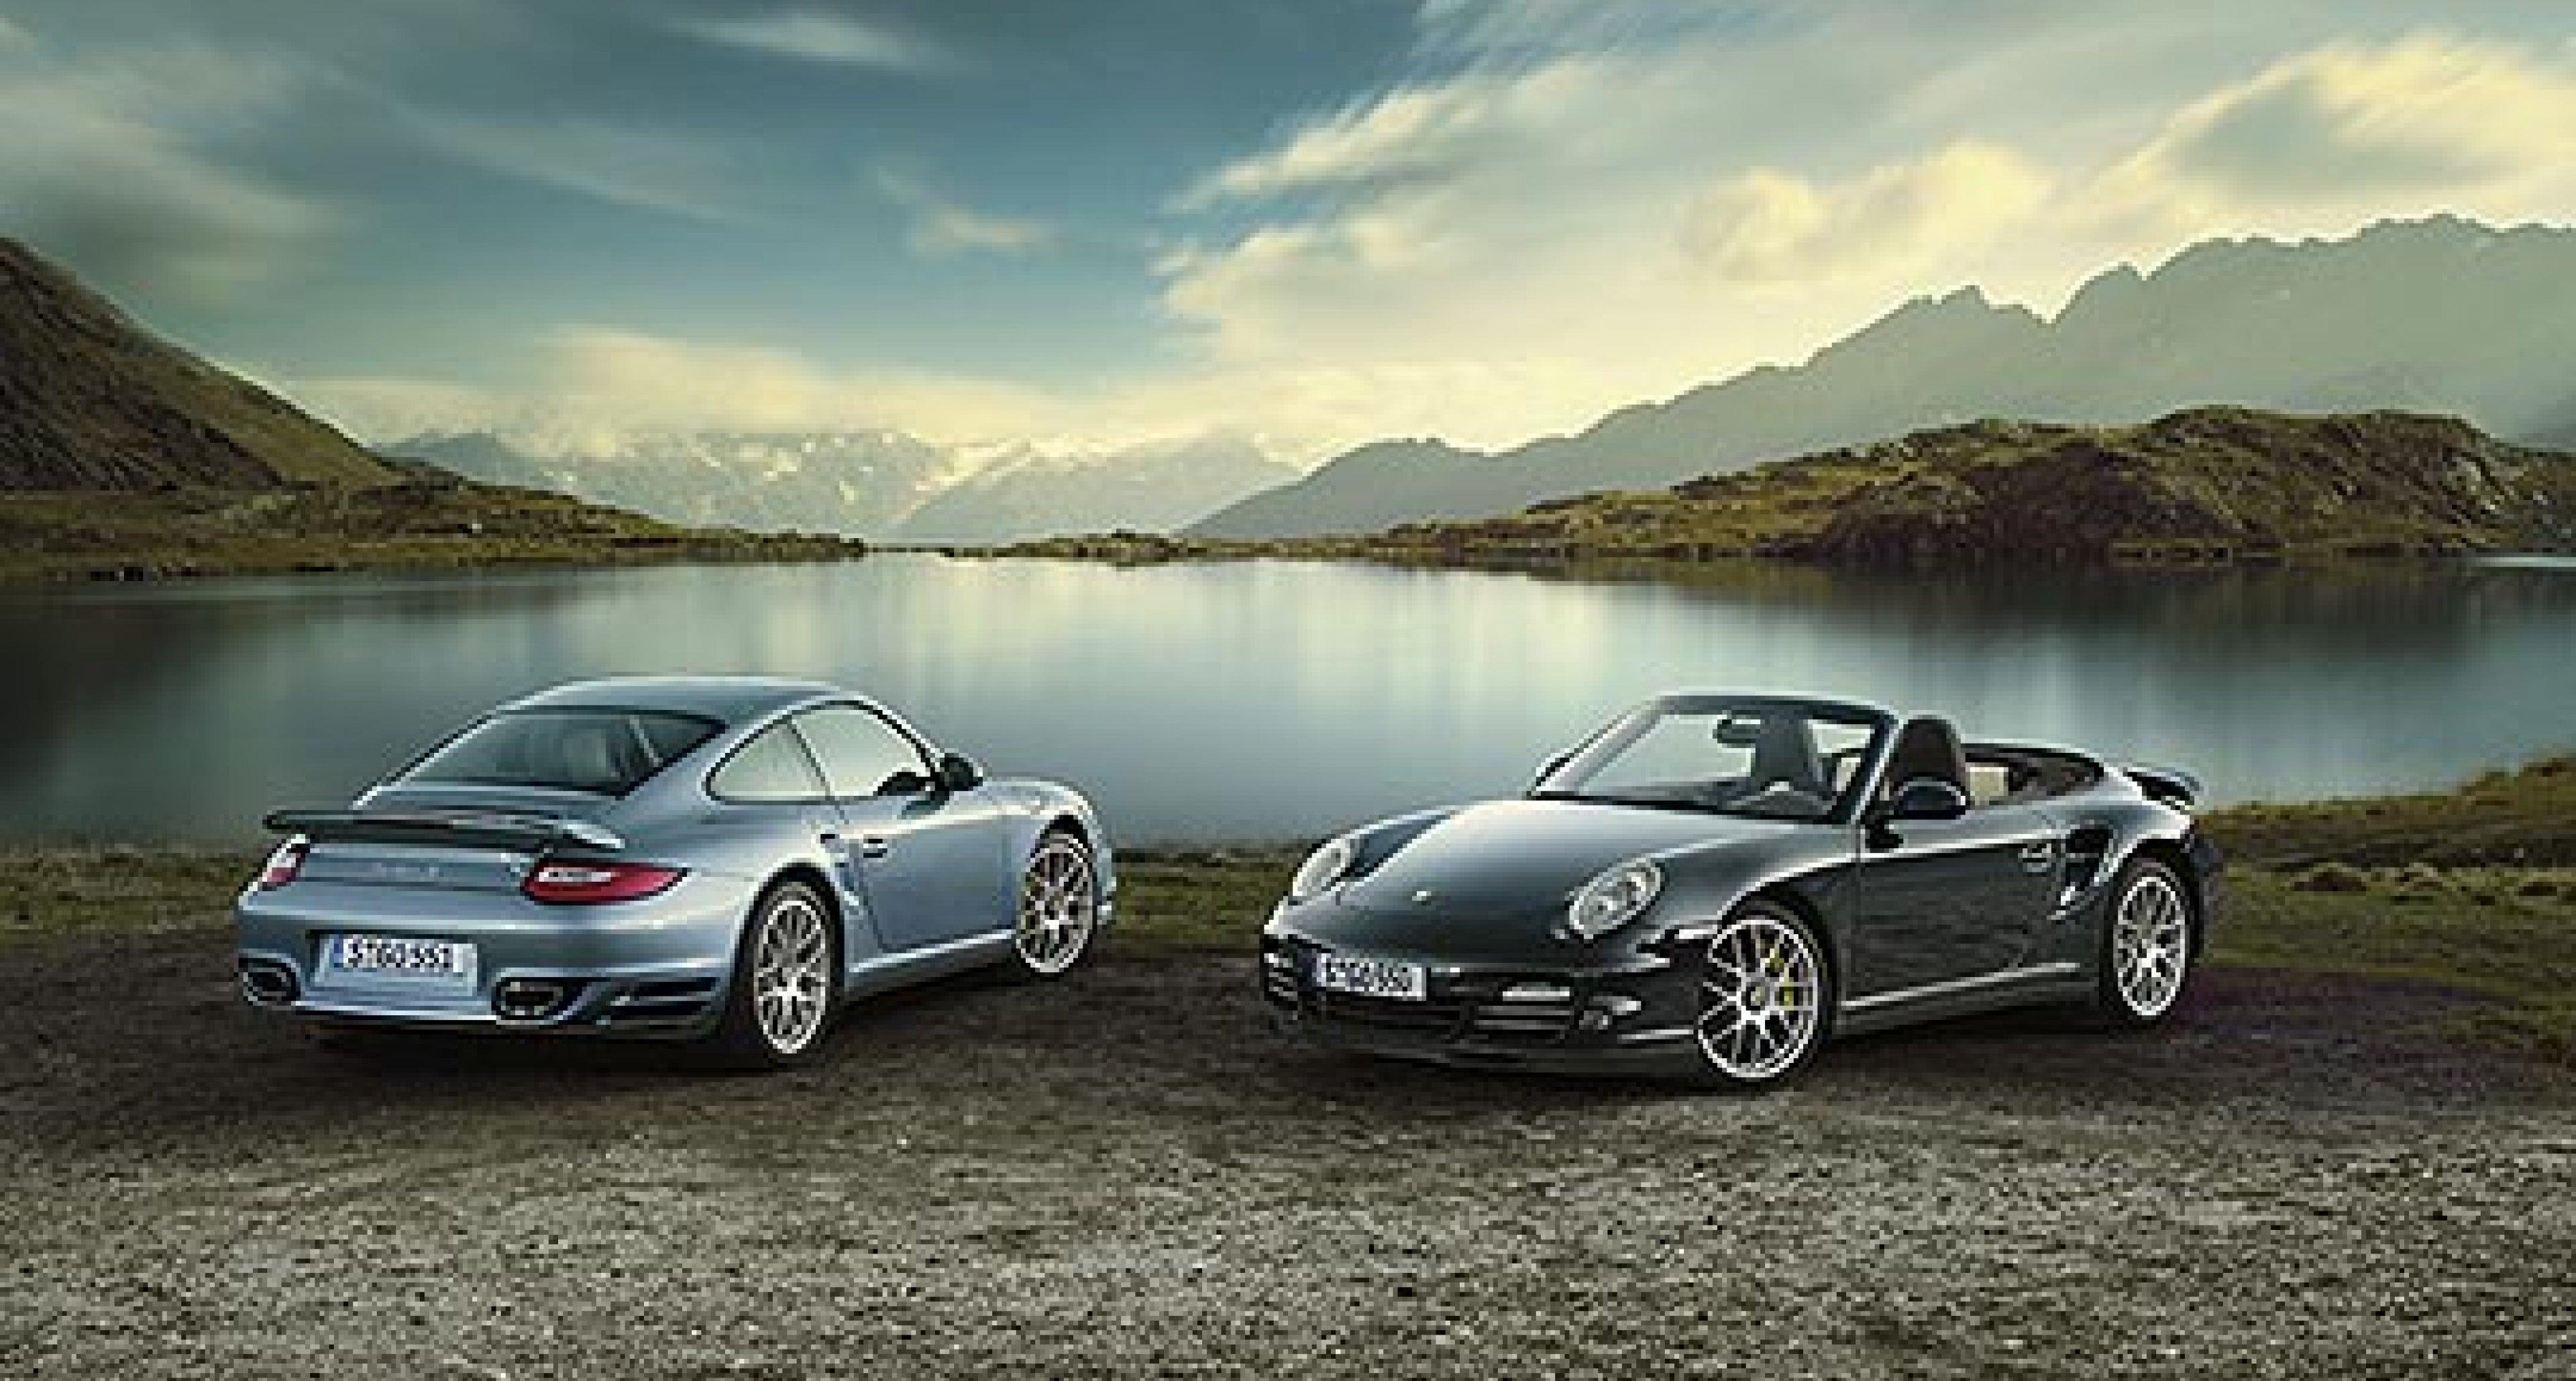 Geneva Preview: Porsche 911 Turbo S